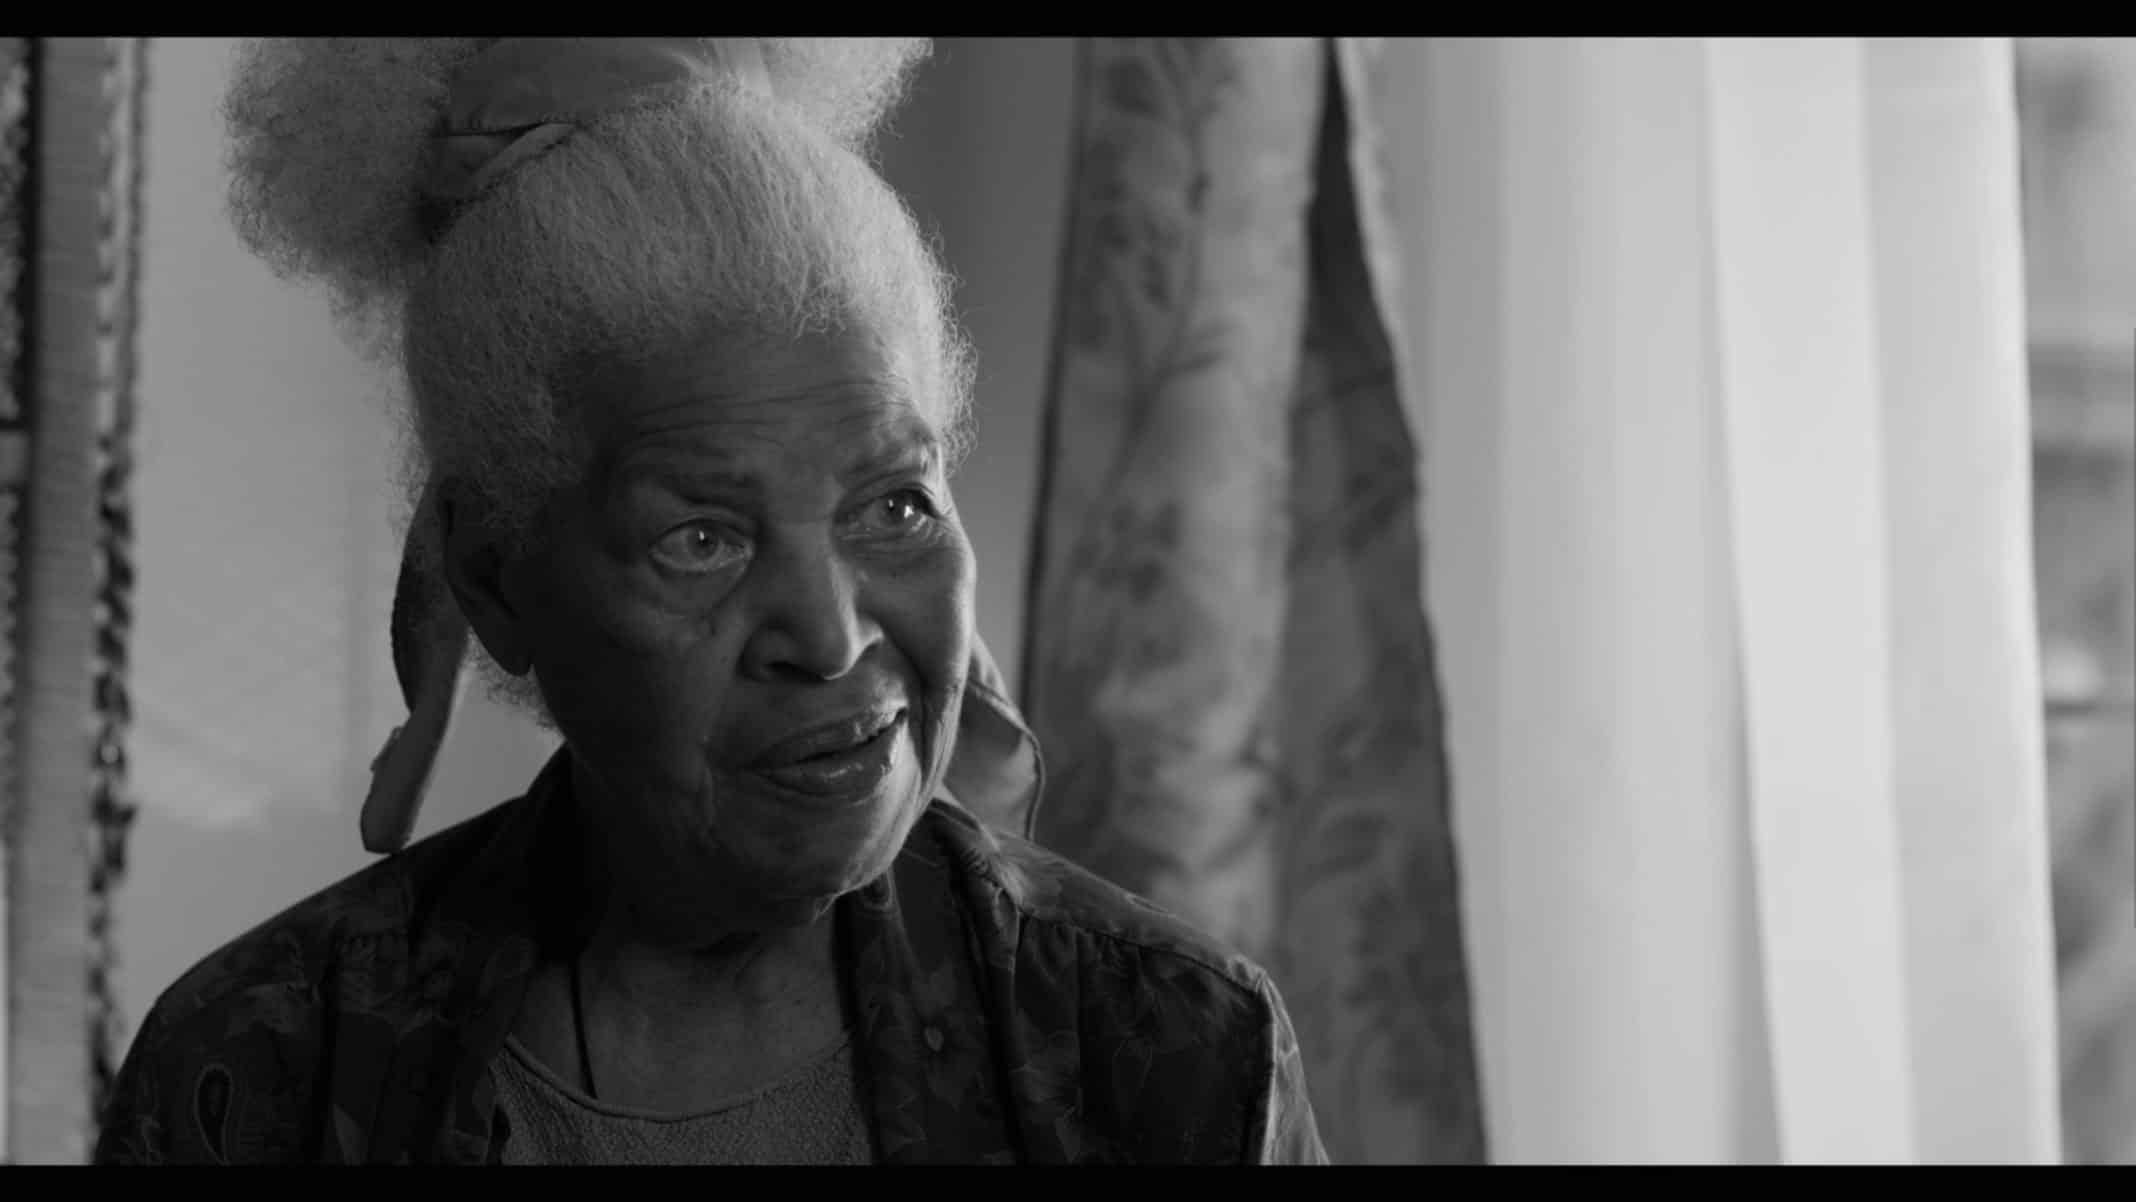 Grandma (Dorothi Fox) sitting at home.